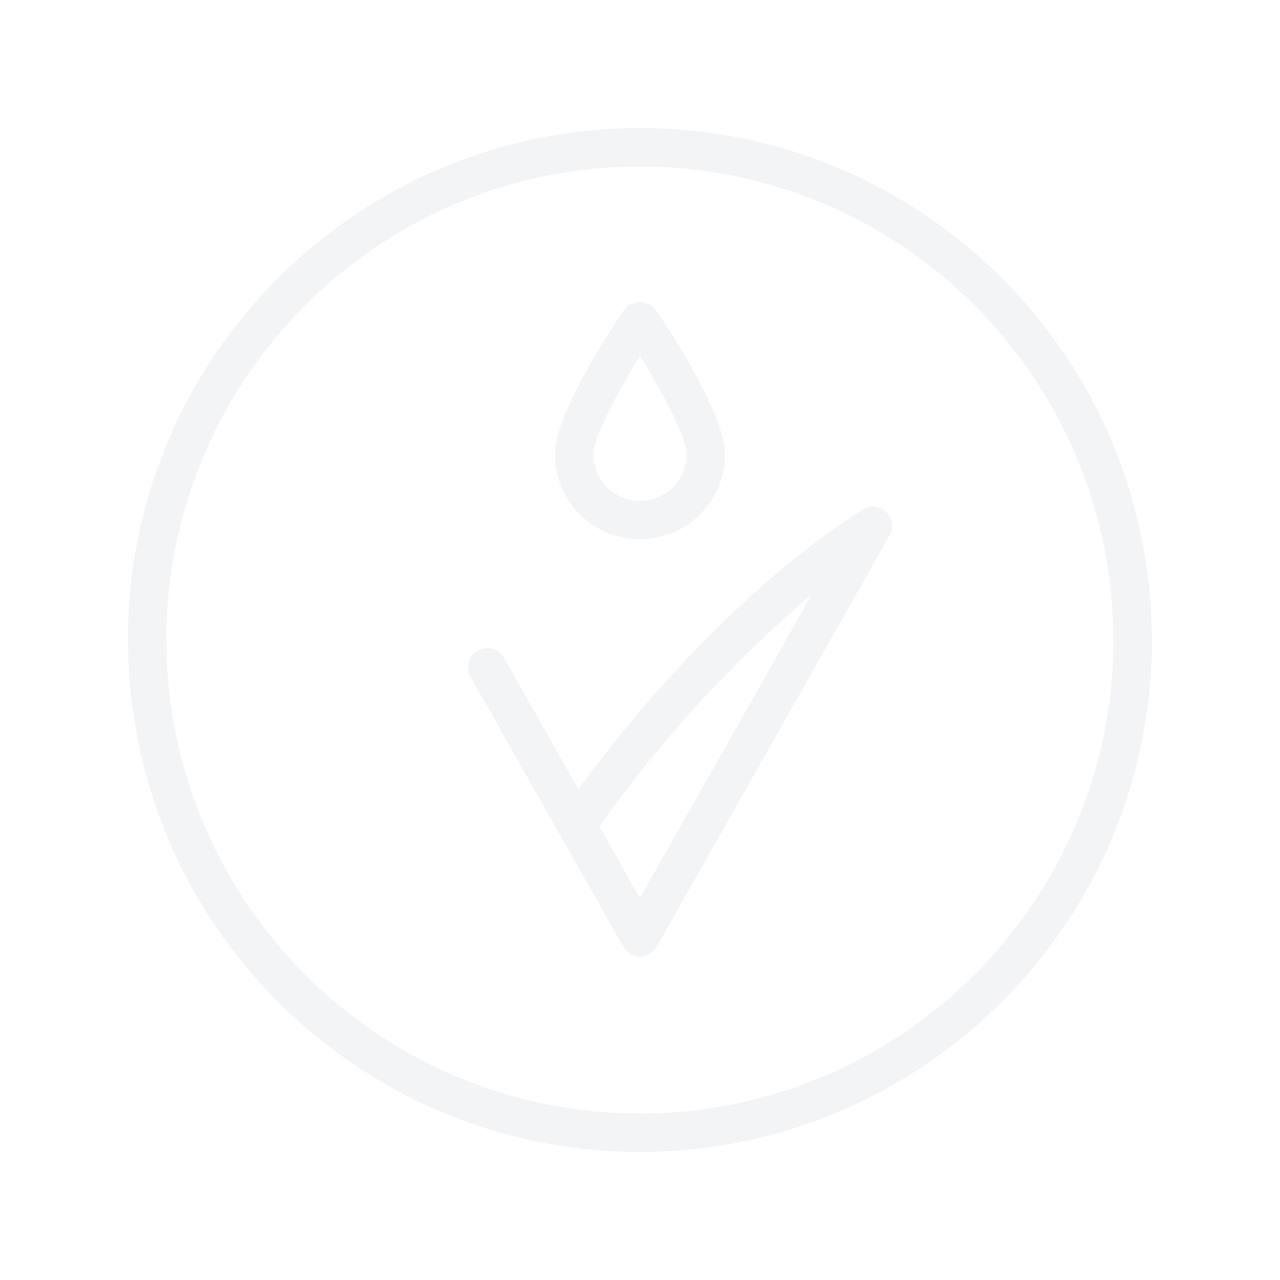 WELLA PROFESSIONALS Invigo Aqua Pure Shampoo